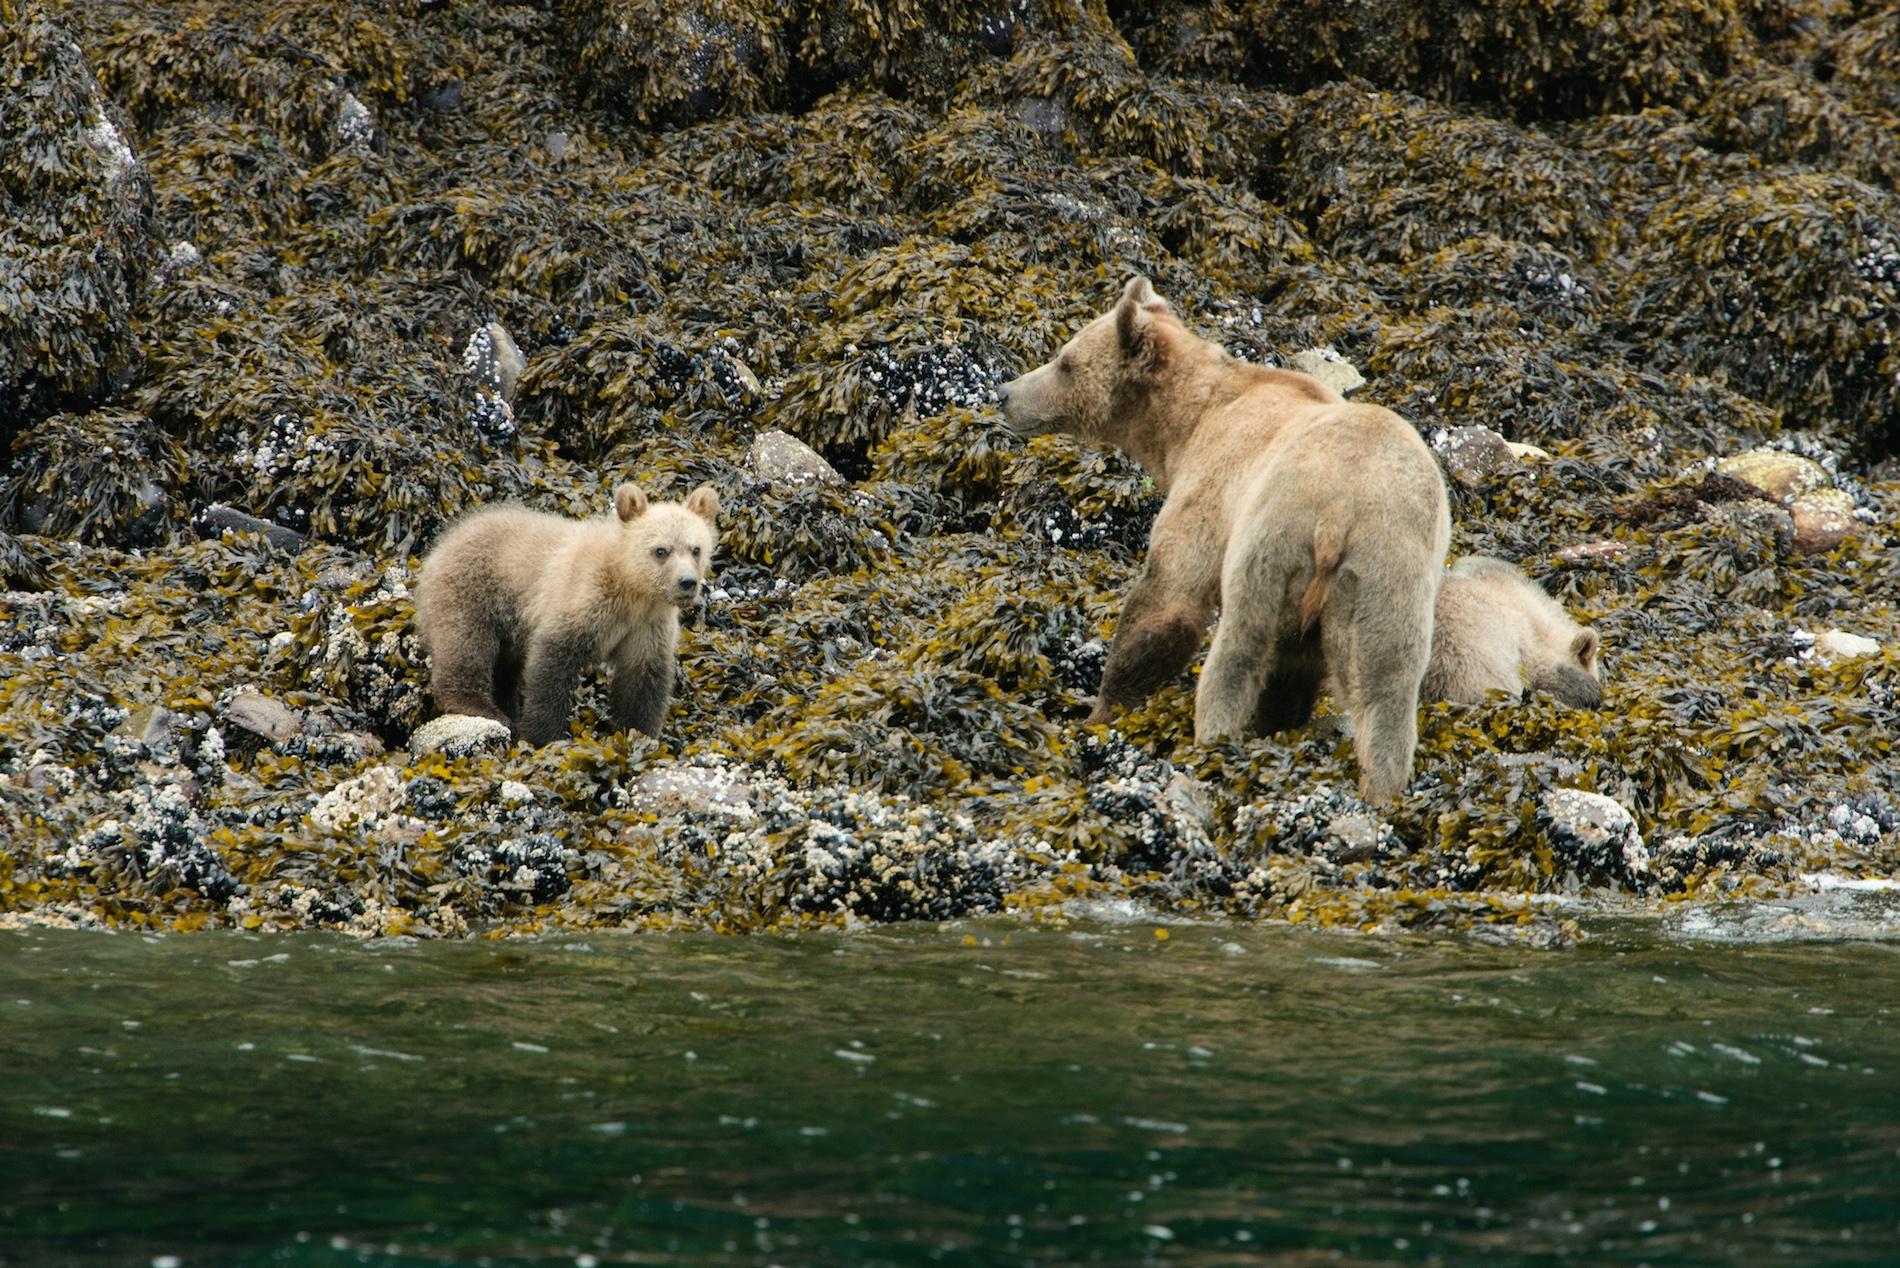 sea-wolf-adventures-bears